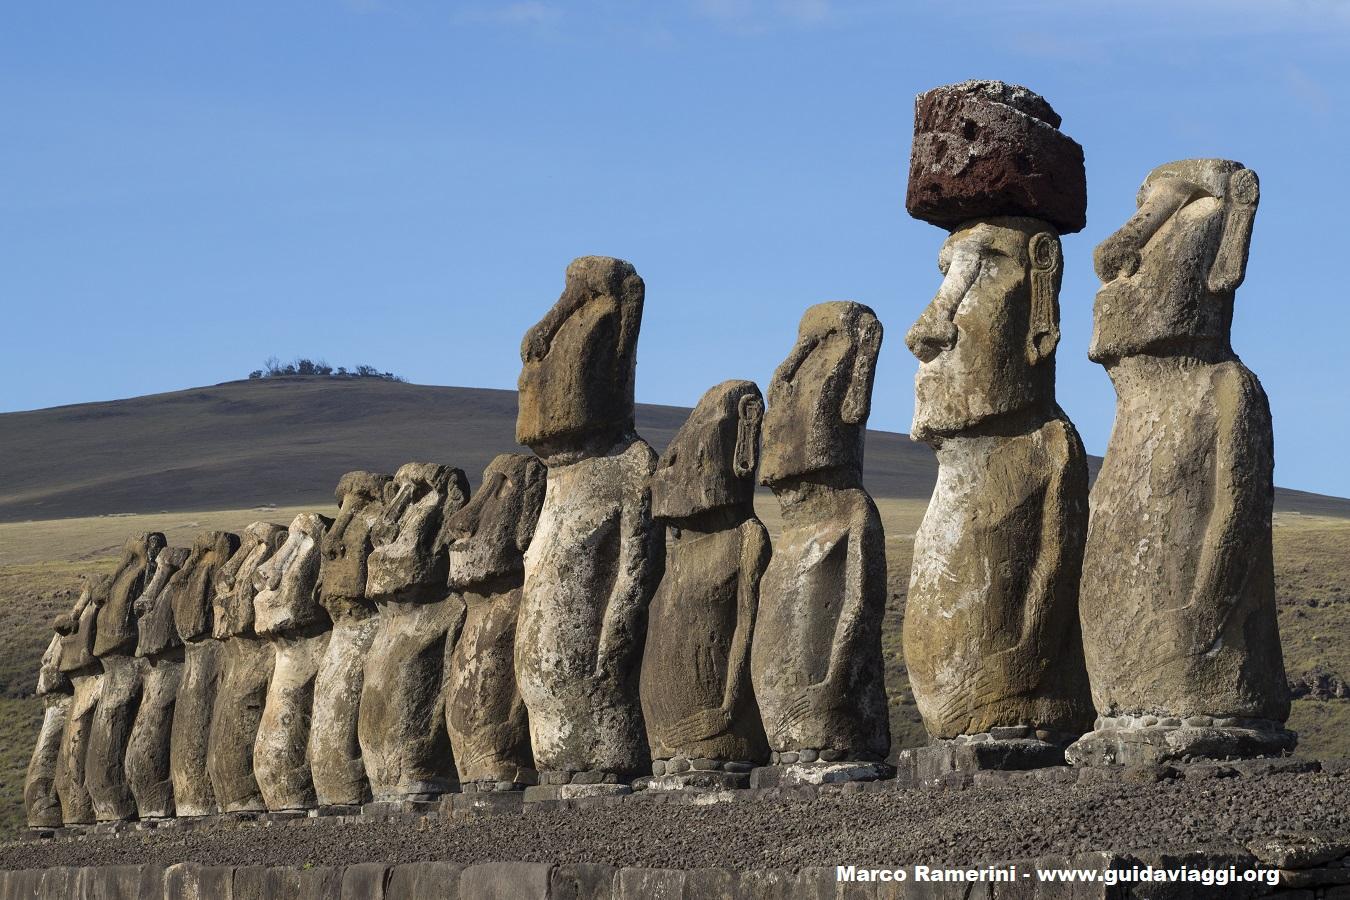 Ahu Tongariki, Isola di Pasqua, Cile. Autore e Copyright Marco Ramerini.